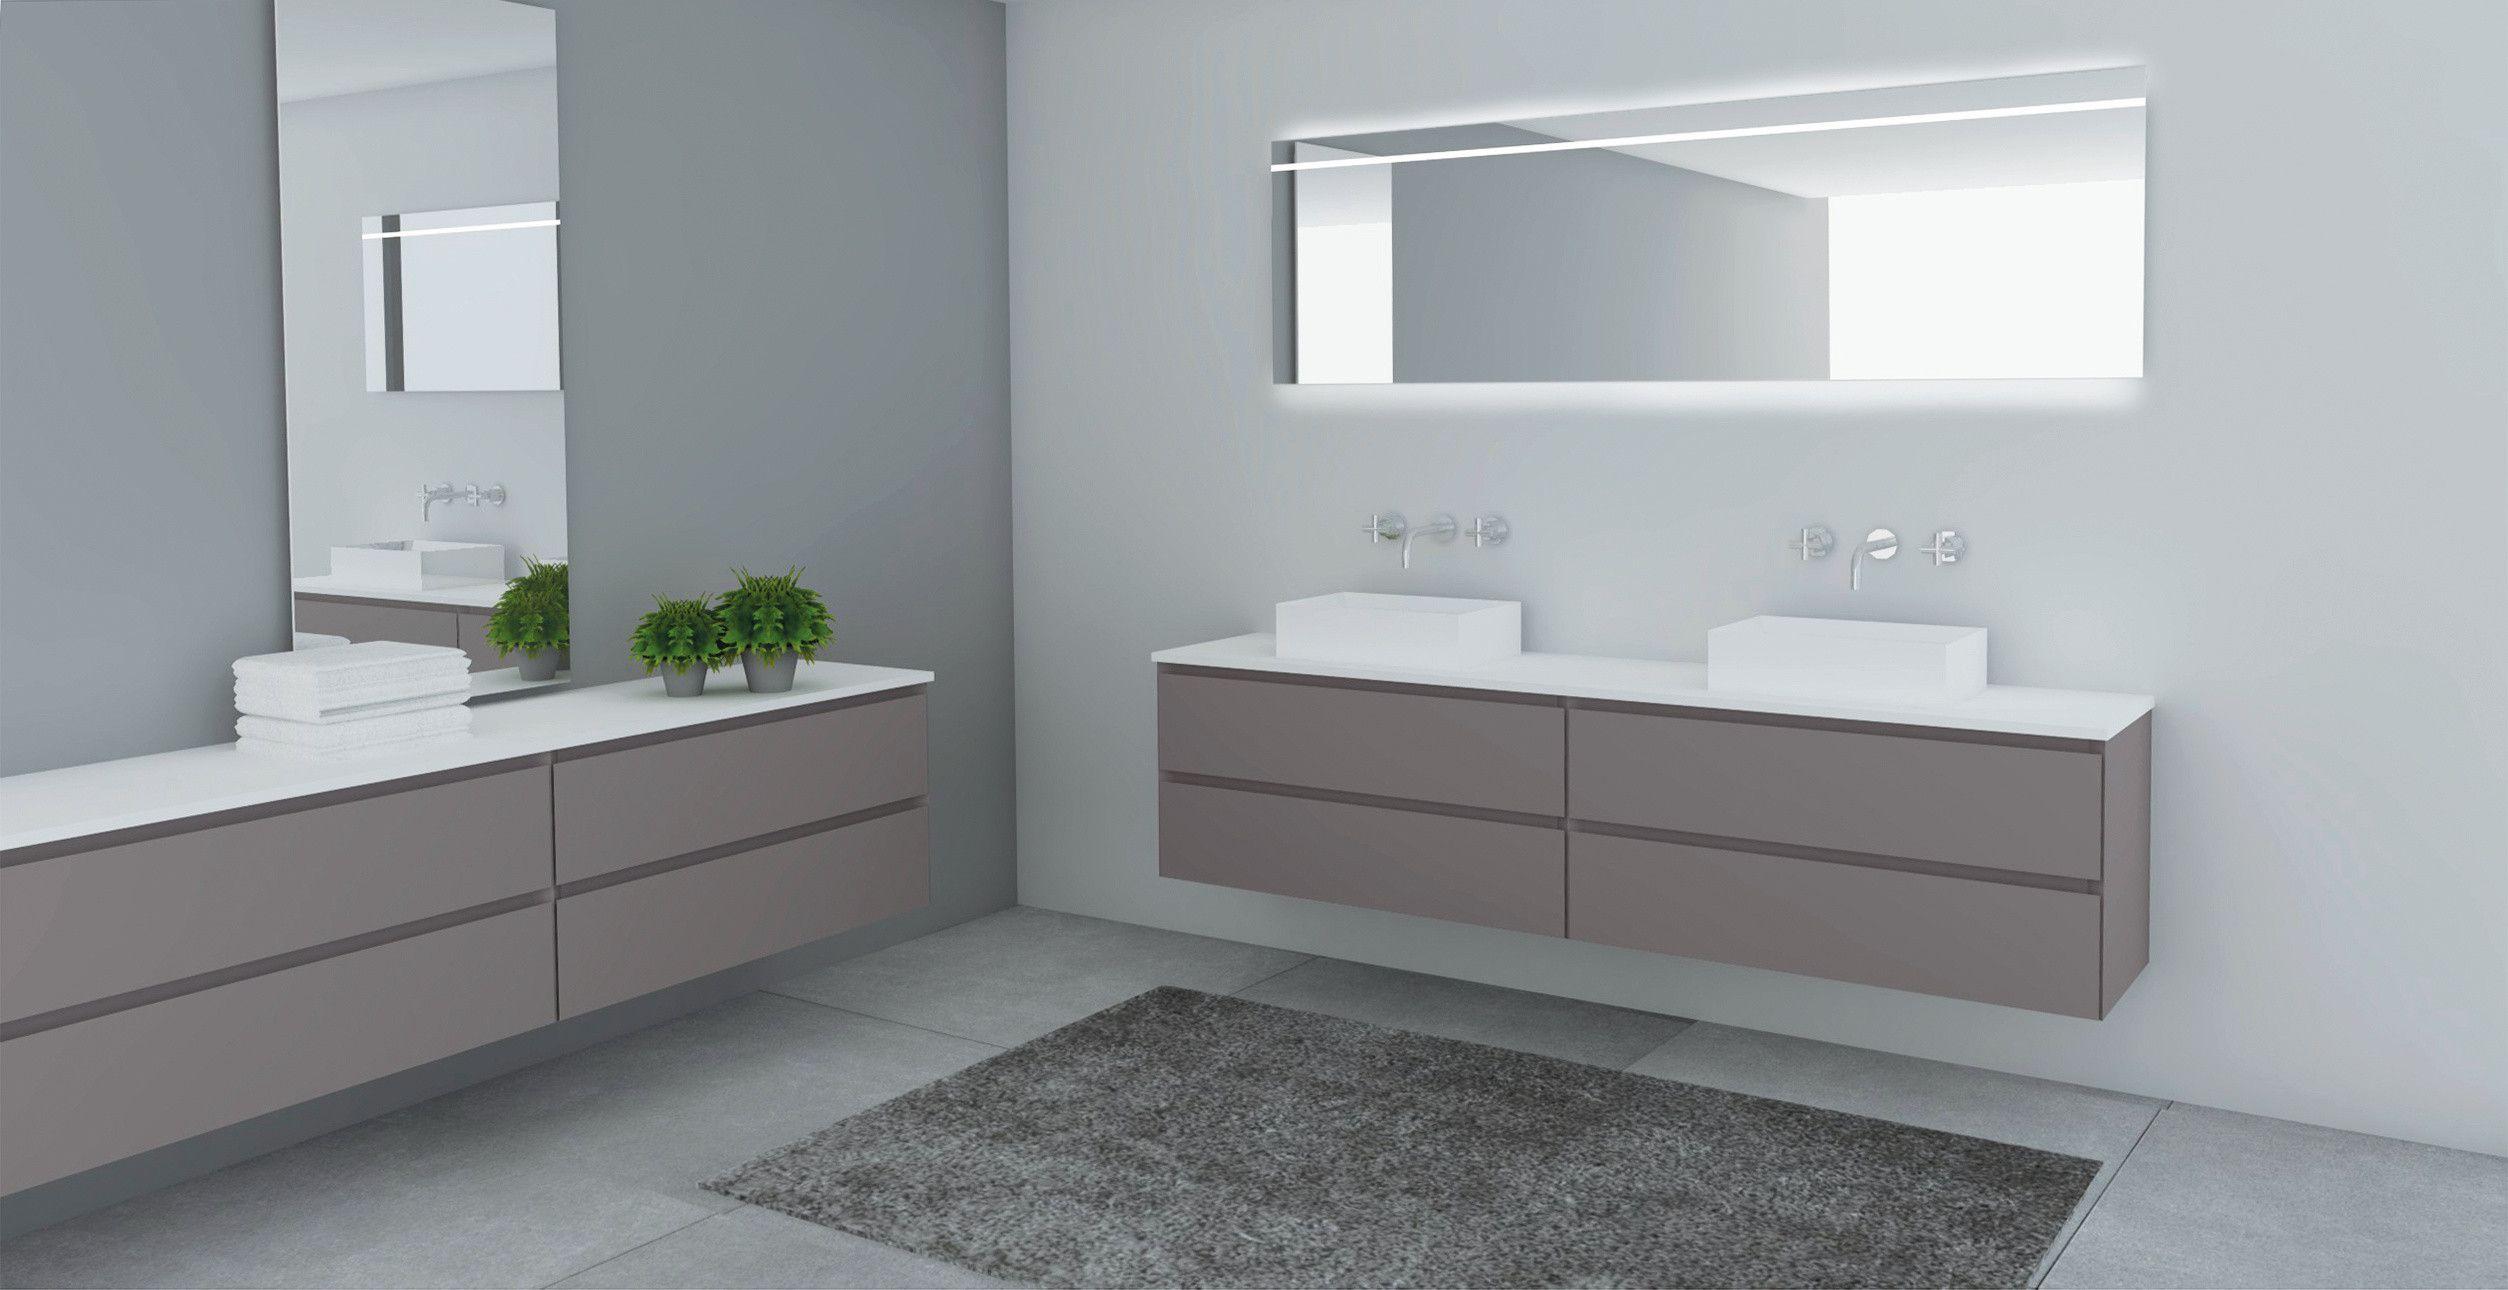 Badkamer Factory Amersfoort : Bliss elements dogma badkamermeubelen badkamer sanibell